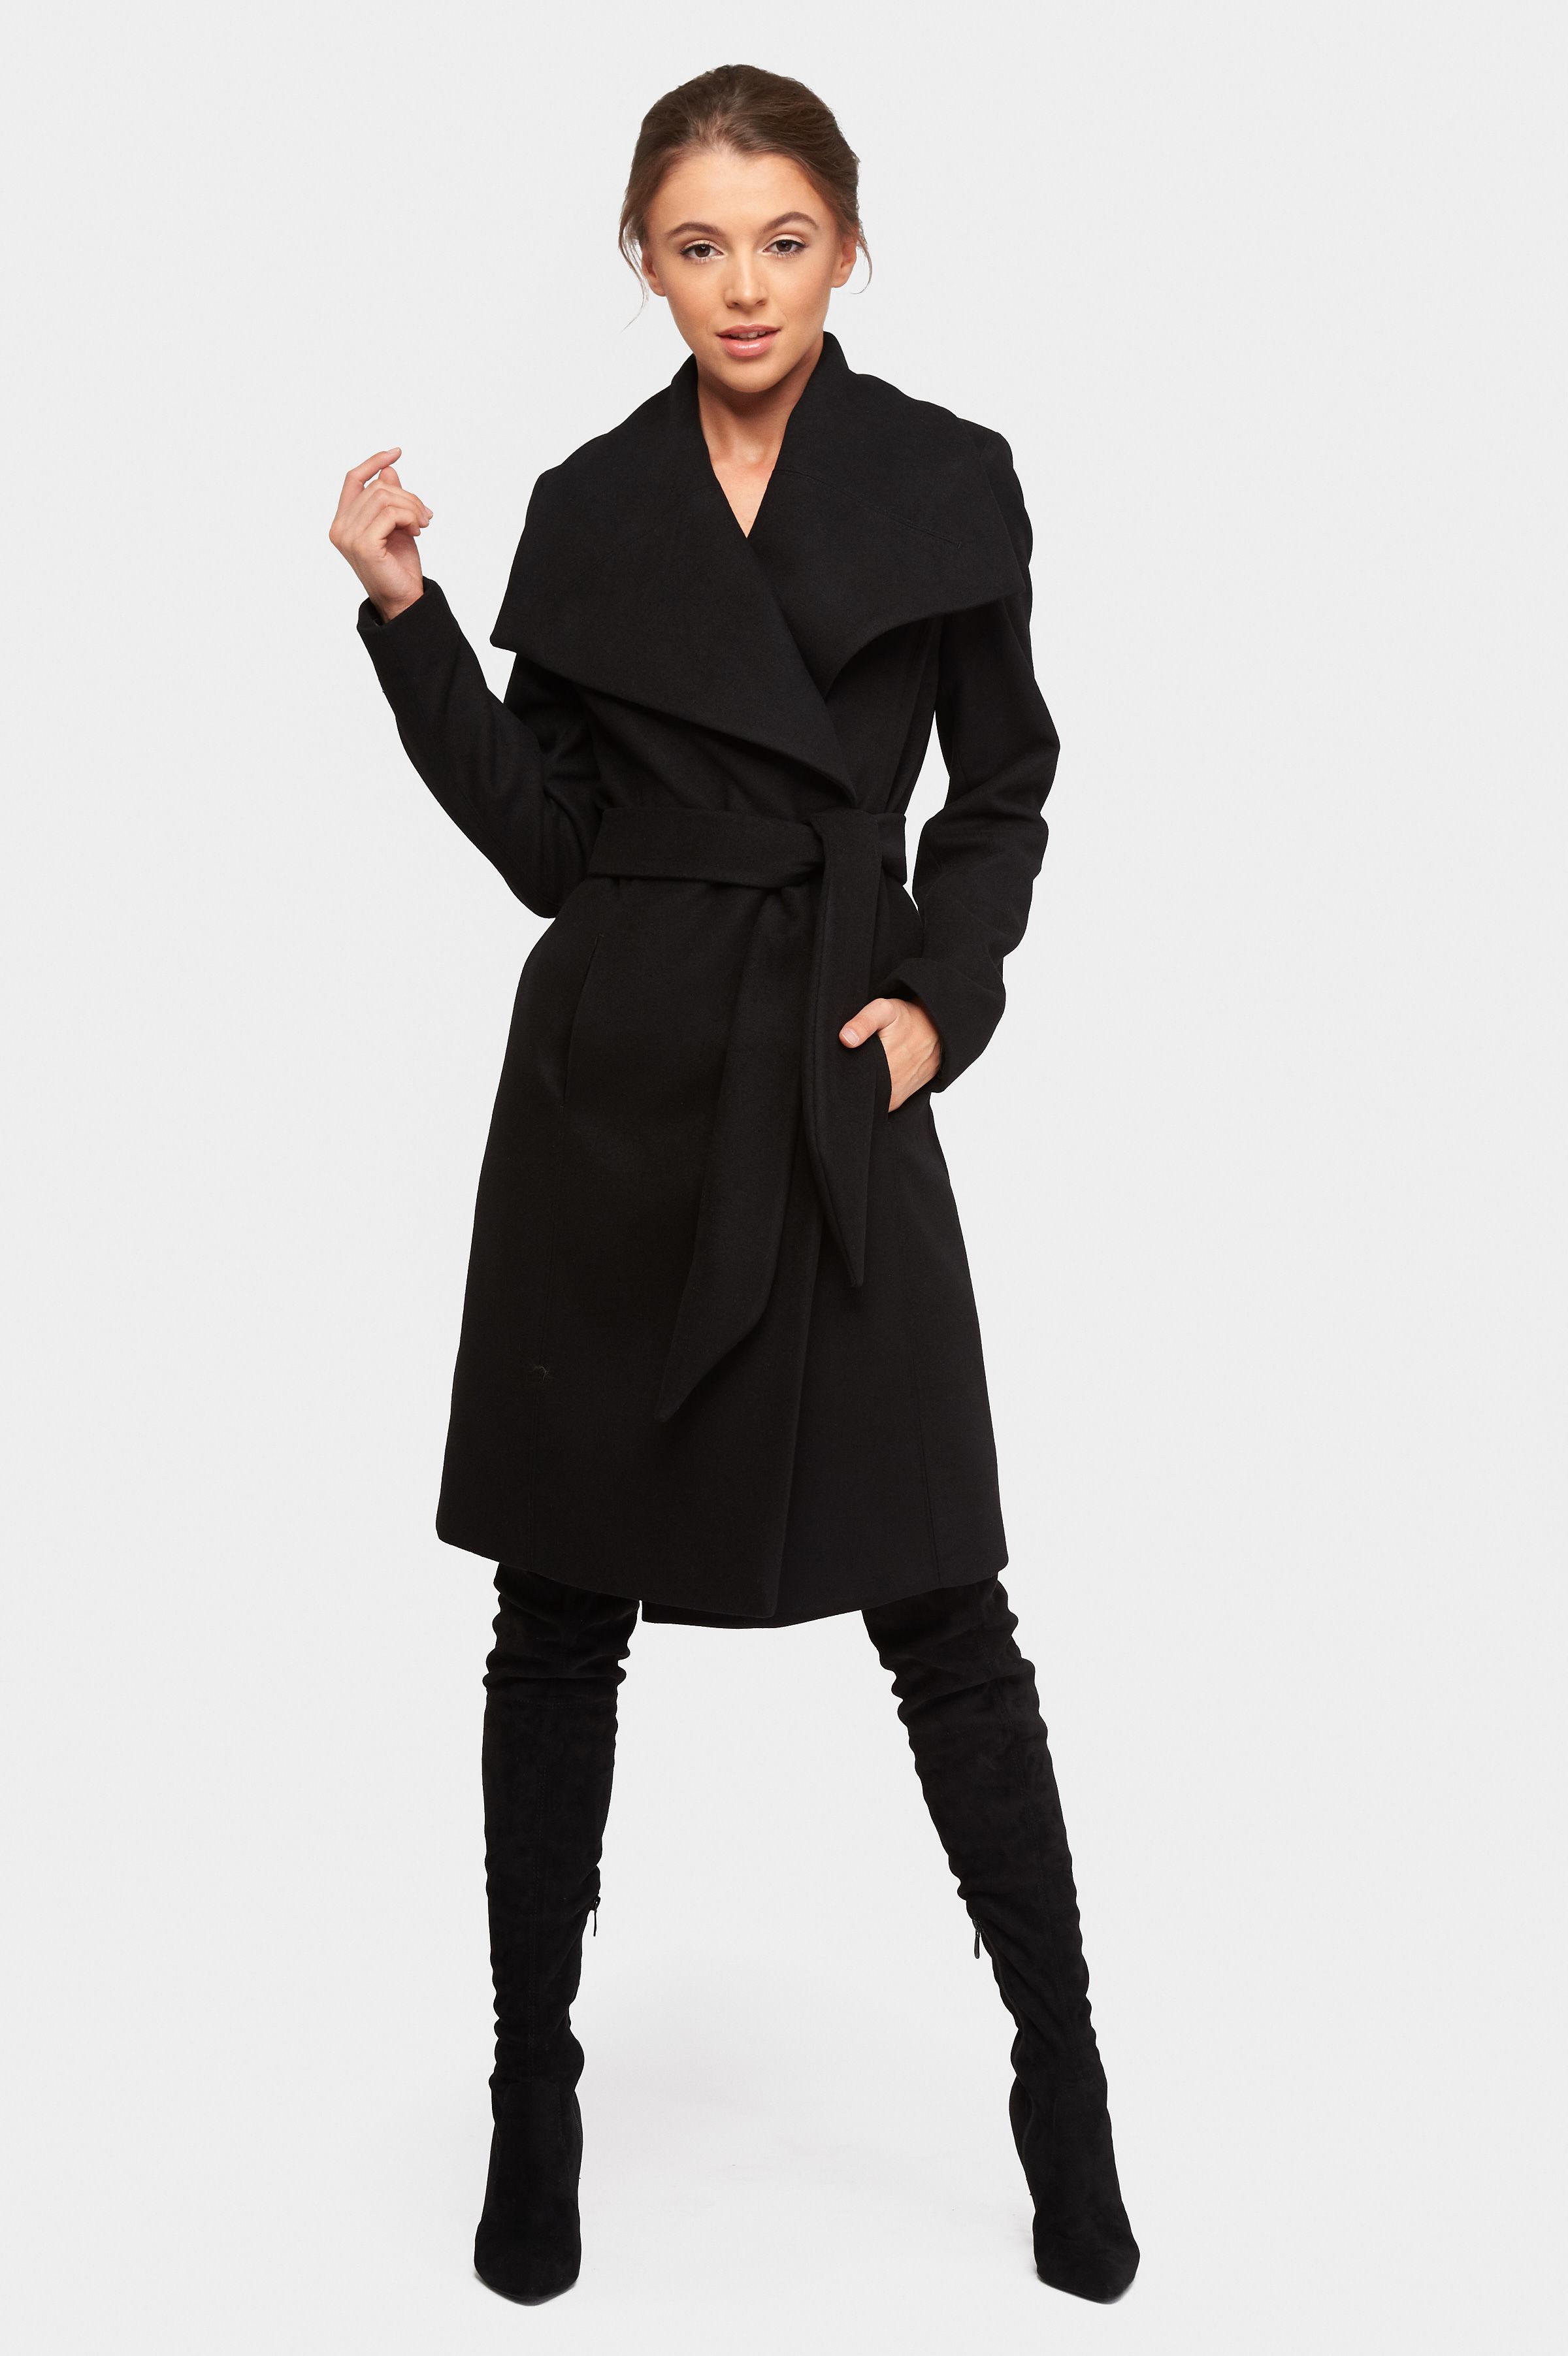 Kabát Adelia - JESEŇ ZIMA 2018 - E-SHOP - Chantall.sk 89706e5b5c